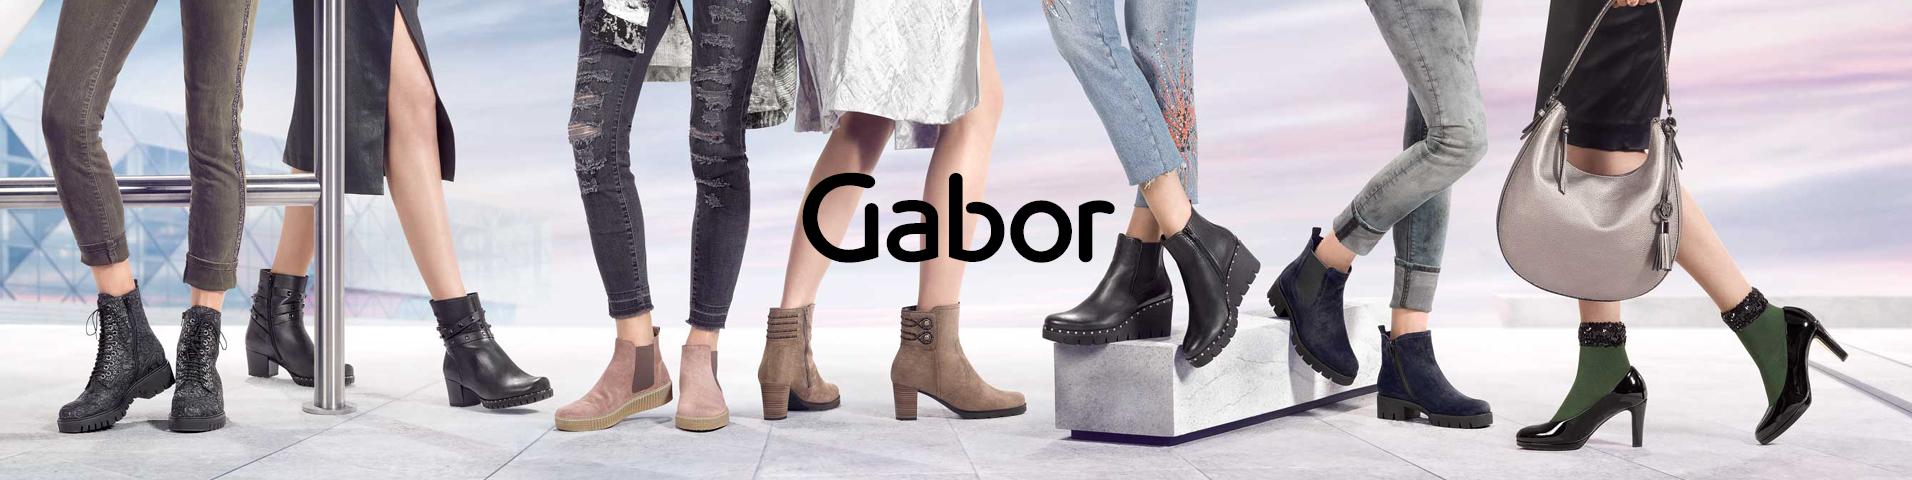 Gabor Pumps online entdecken   Es geht hoch hinaus bei ZALANDO 66c6f8a10e